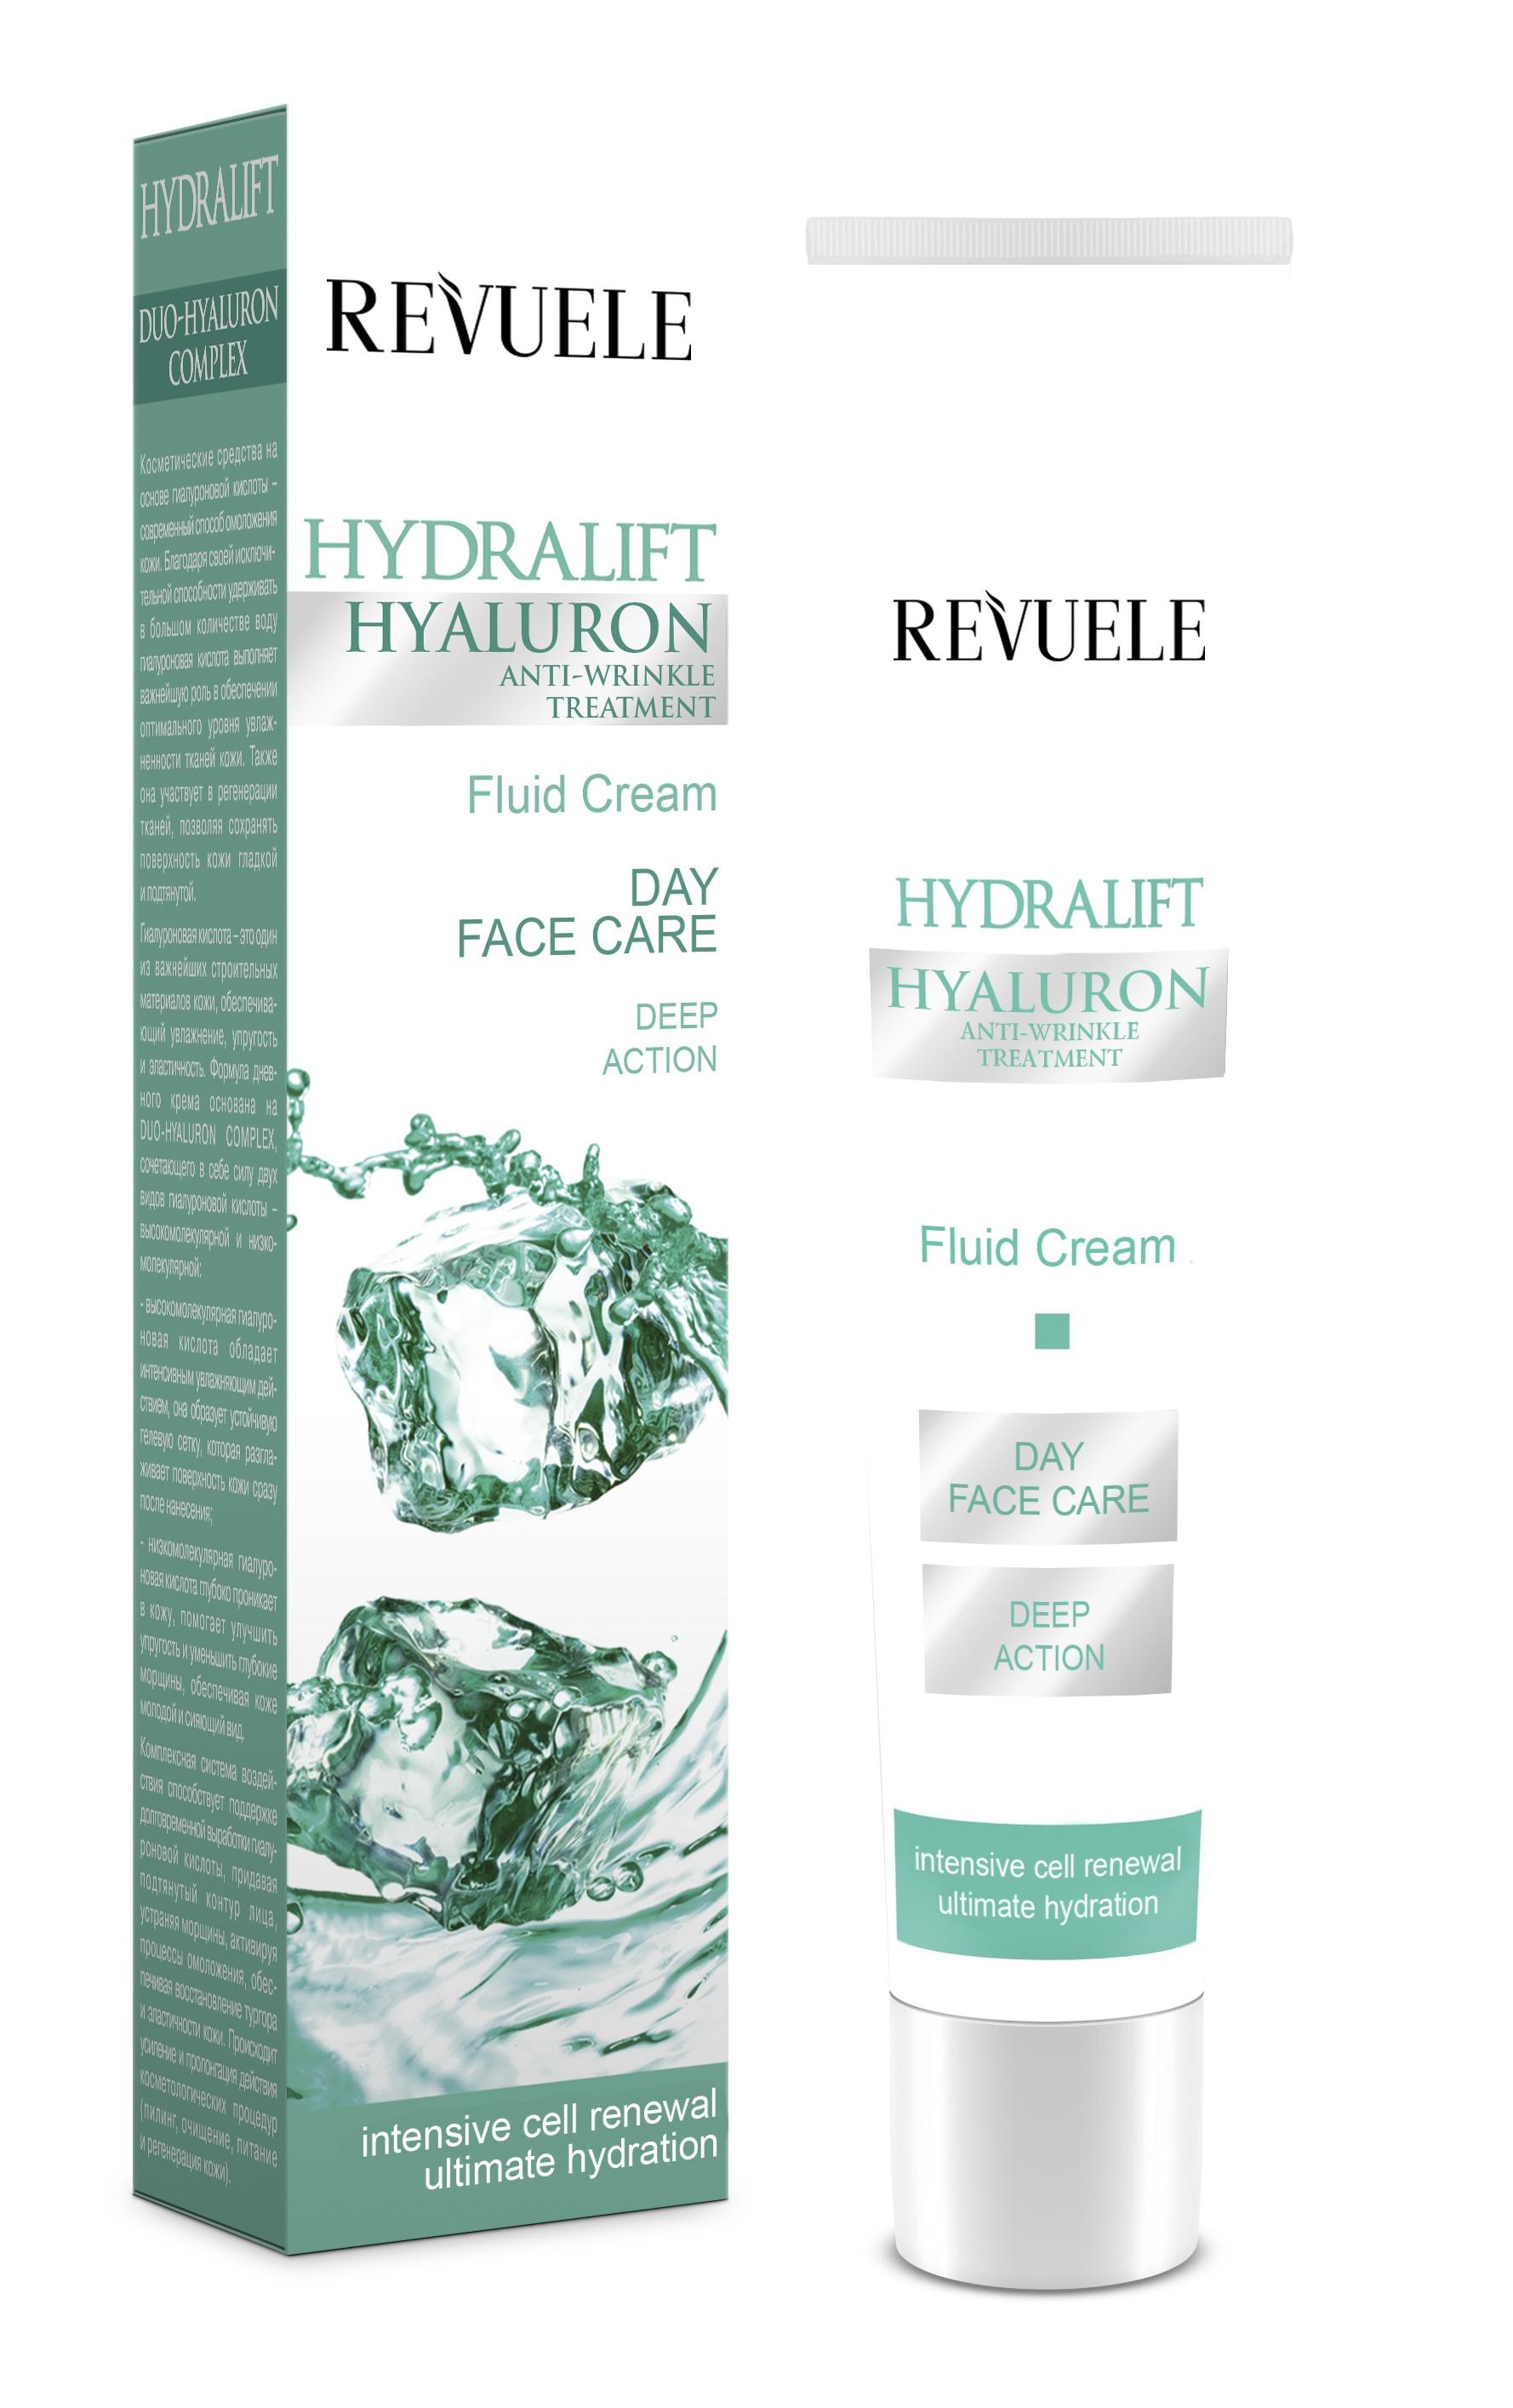 Revuele Hydralift Hyaluron Day Cream Fluid